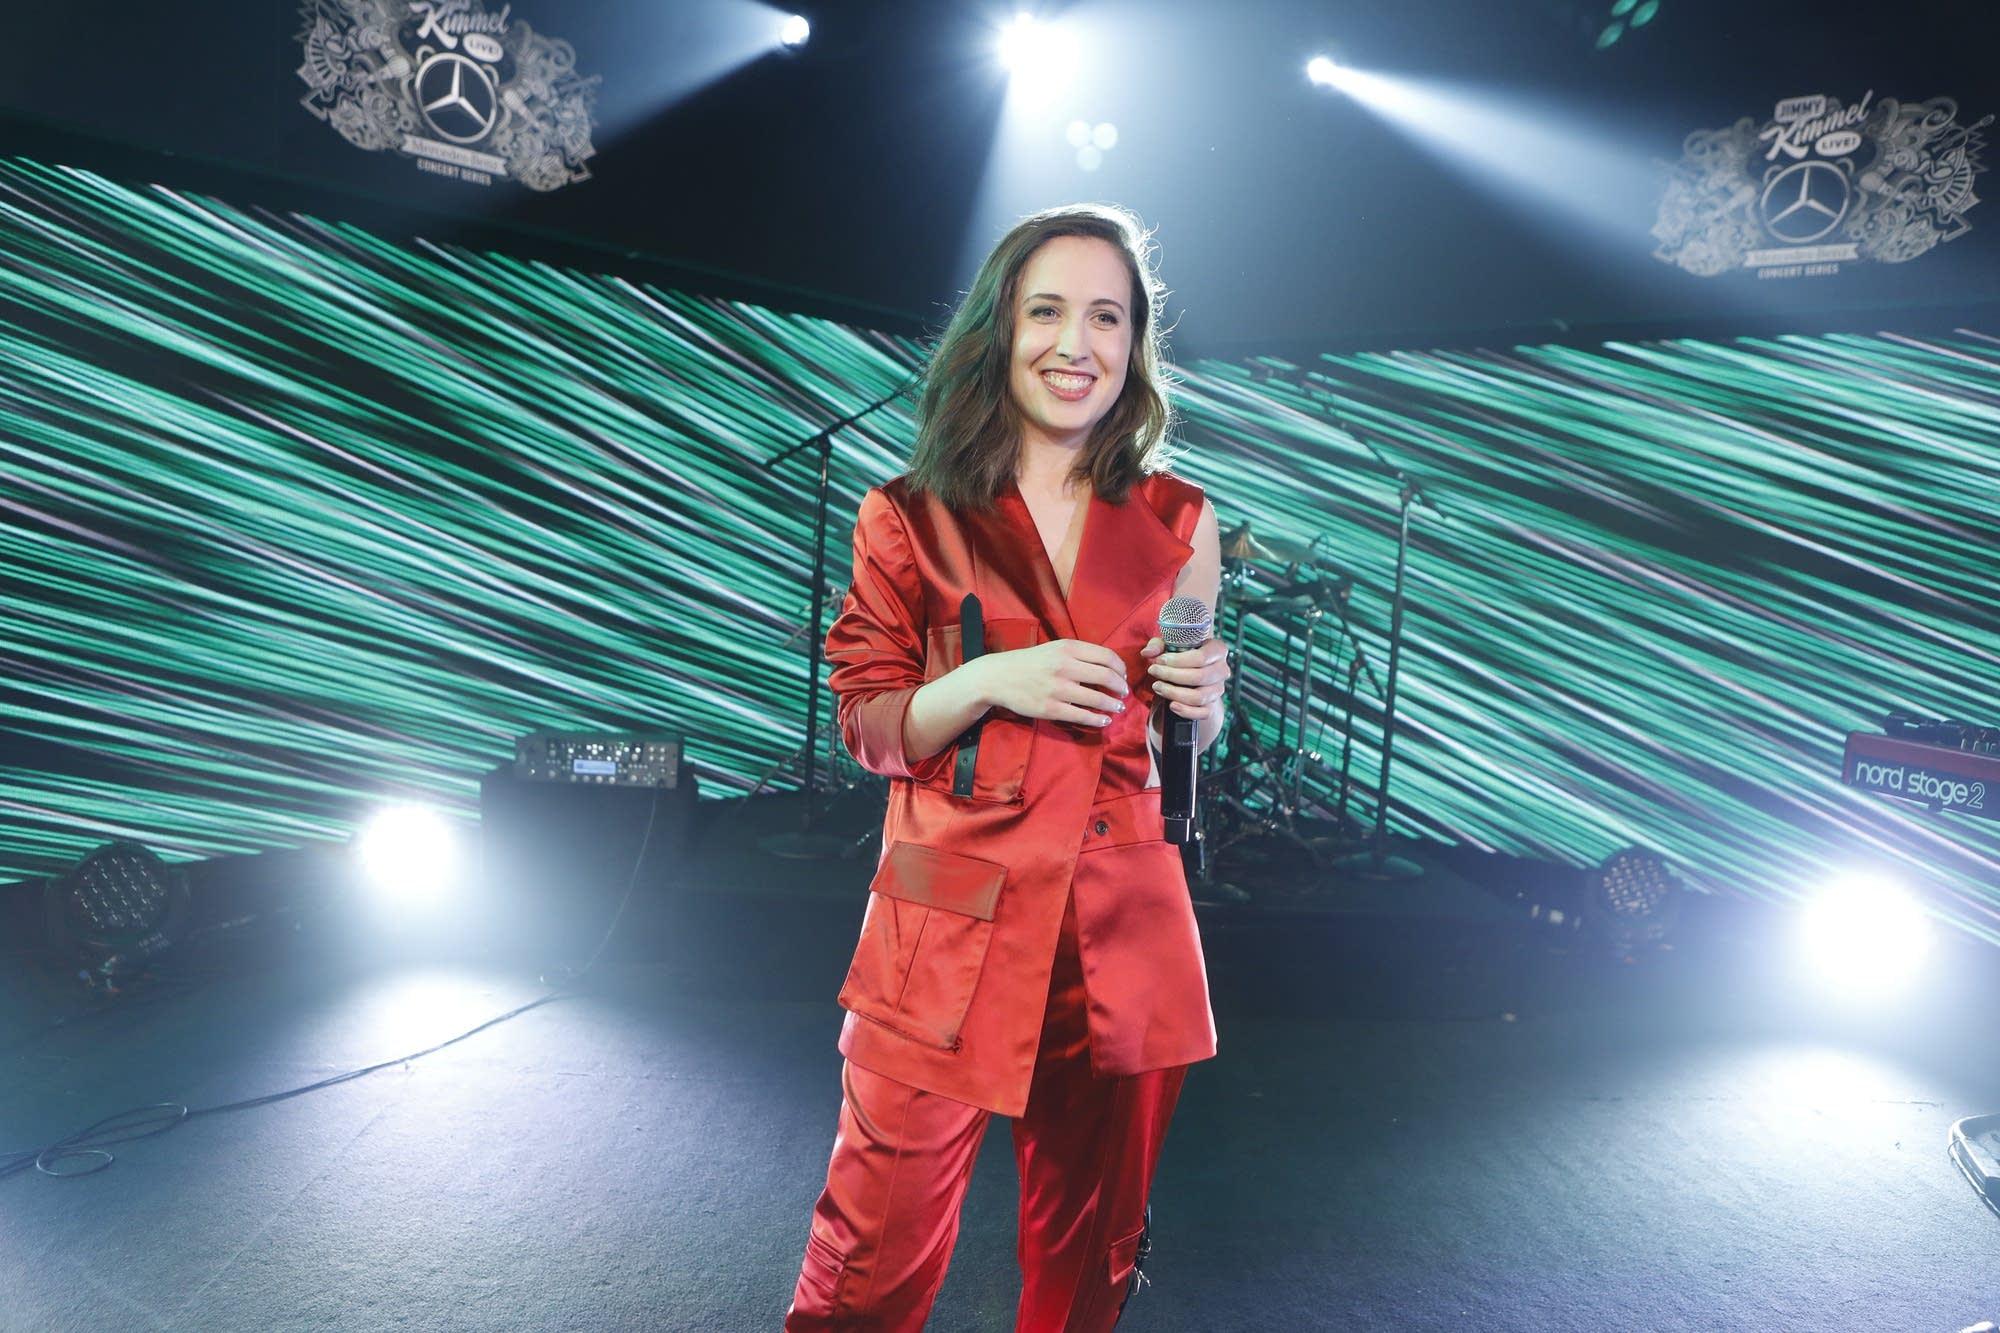 Alice Merton performs on 'Jimmy Kimmel Live' on ABC